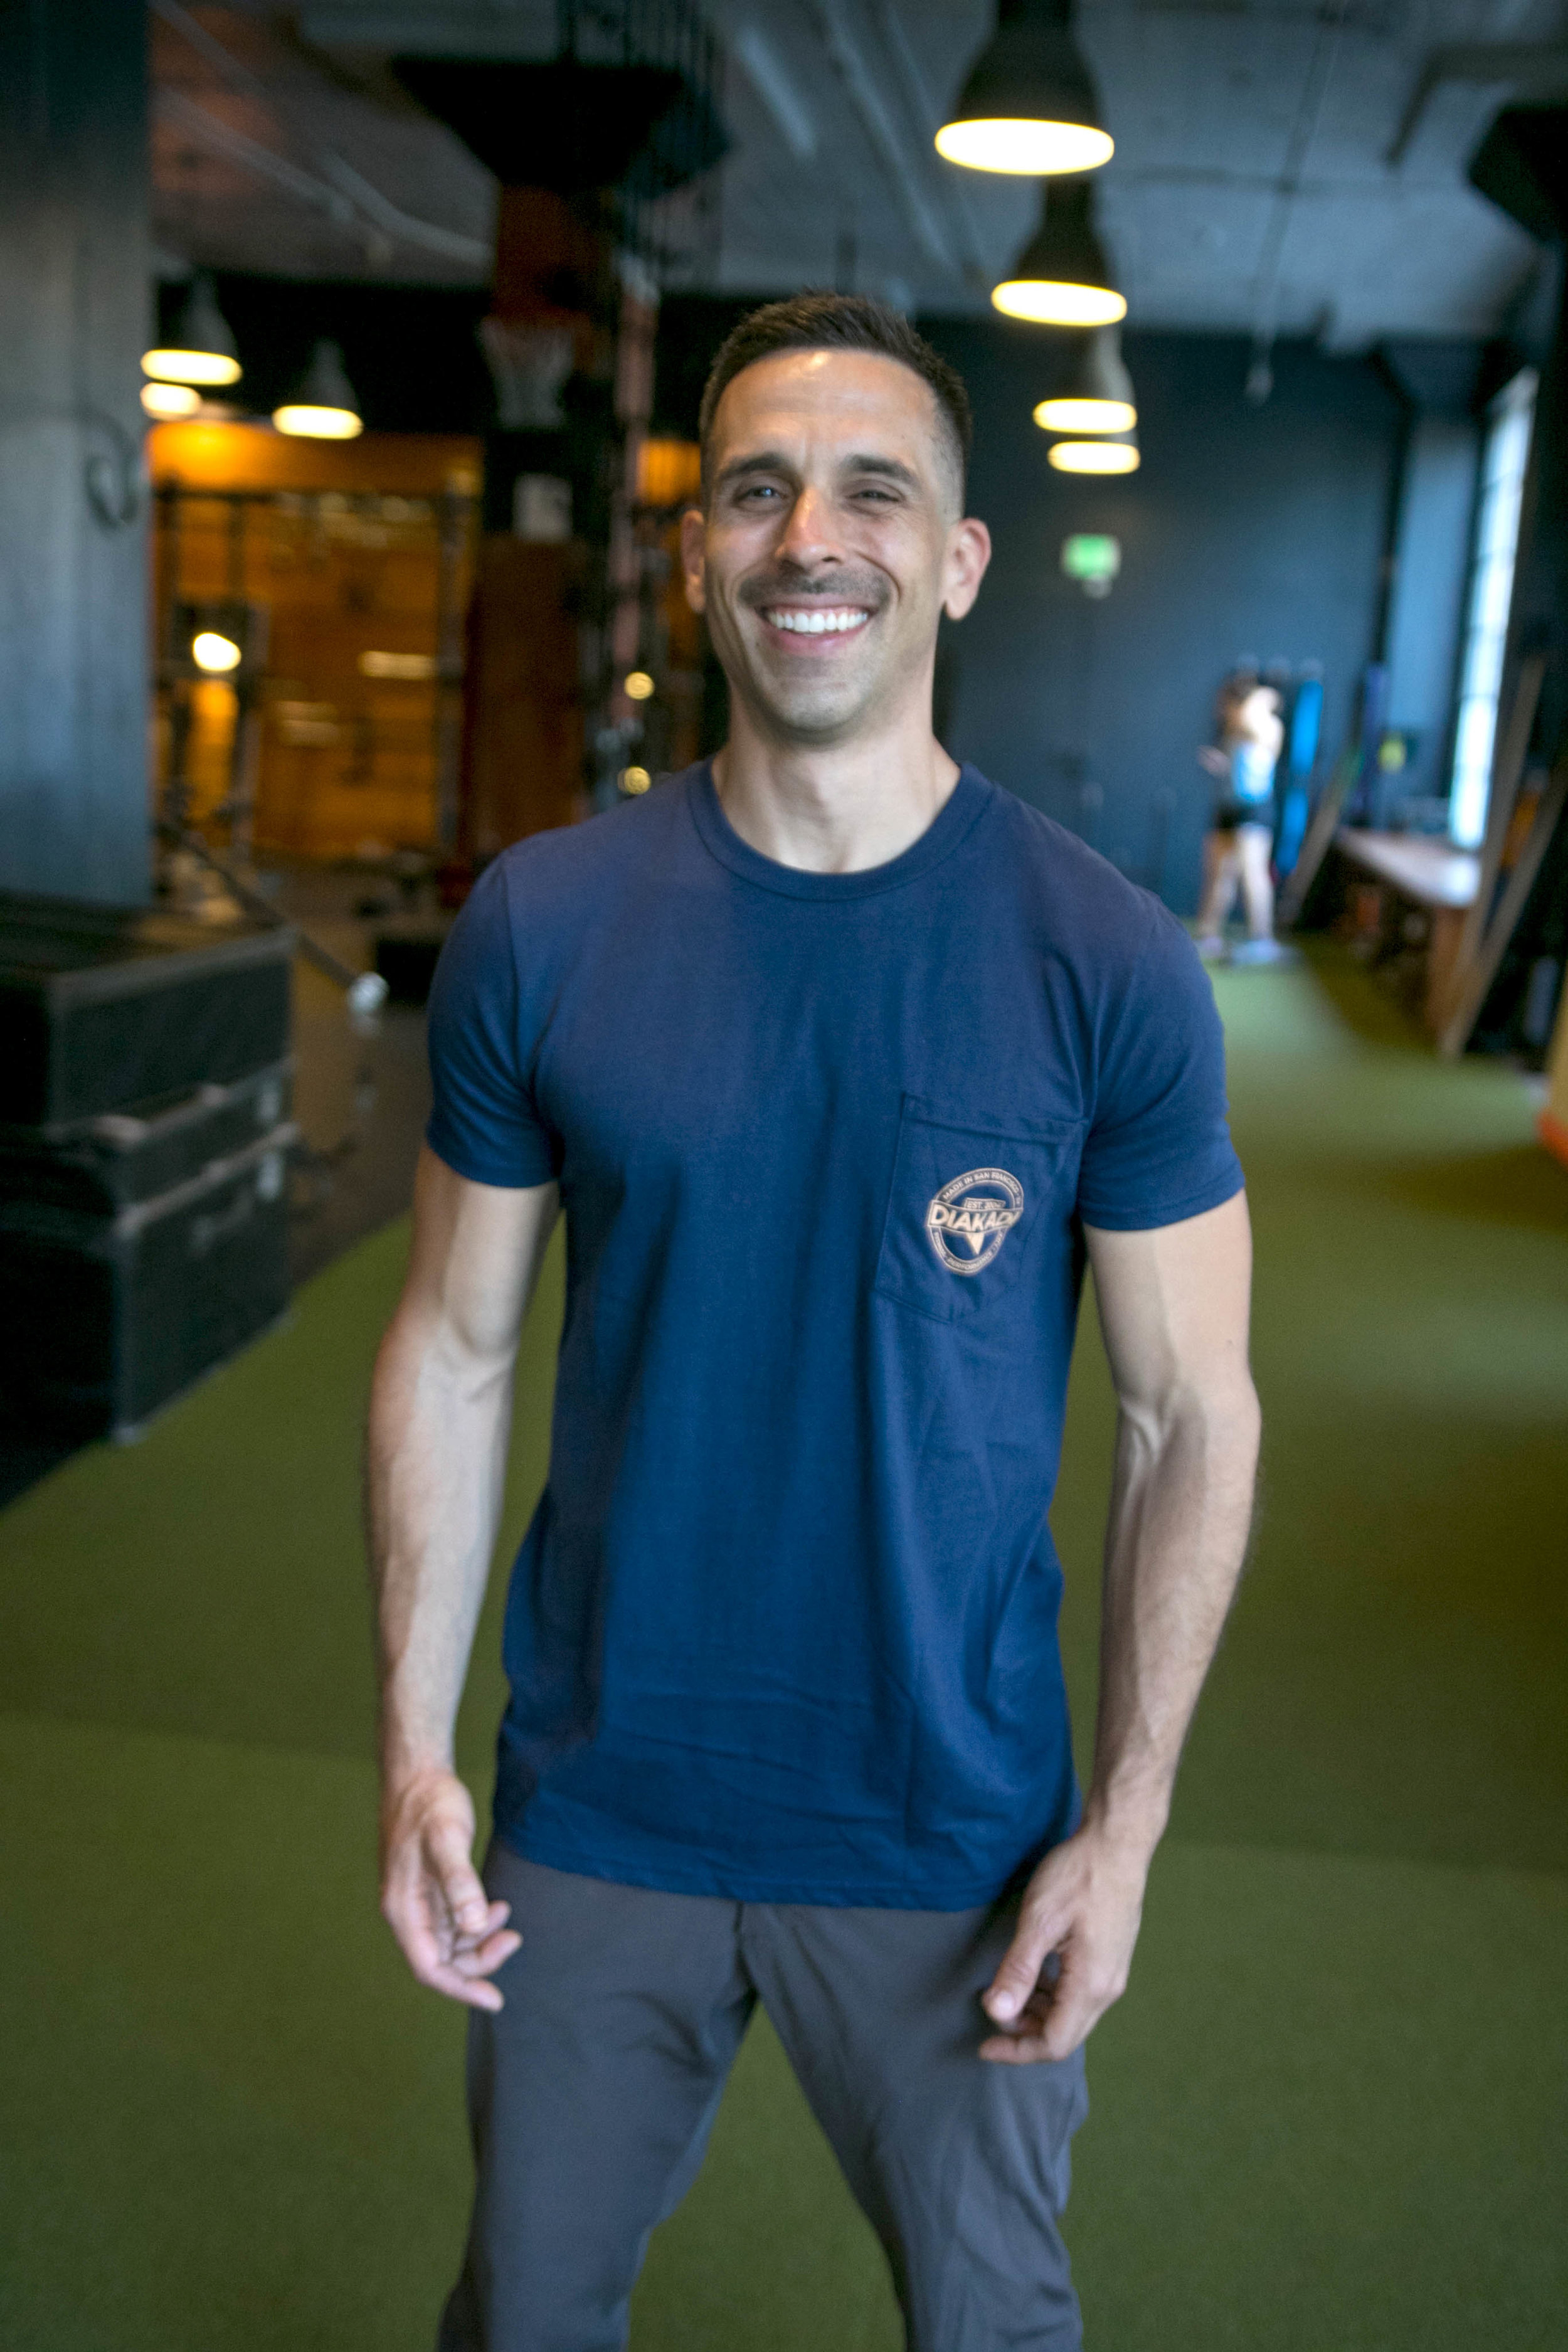 Alvaro Campos DIAKADI Trainer American Ninja Warrior.jpg